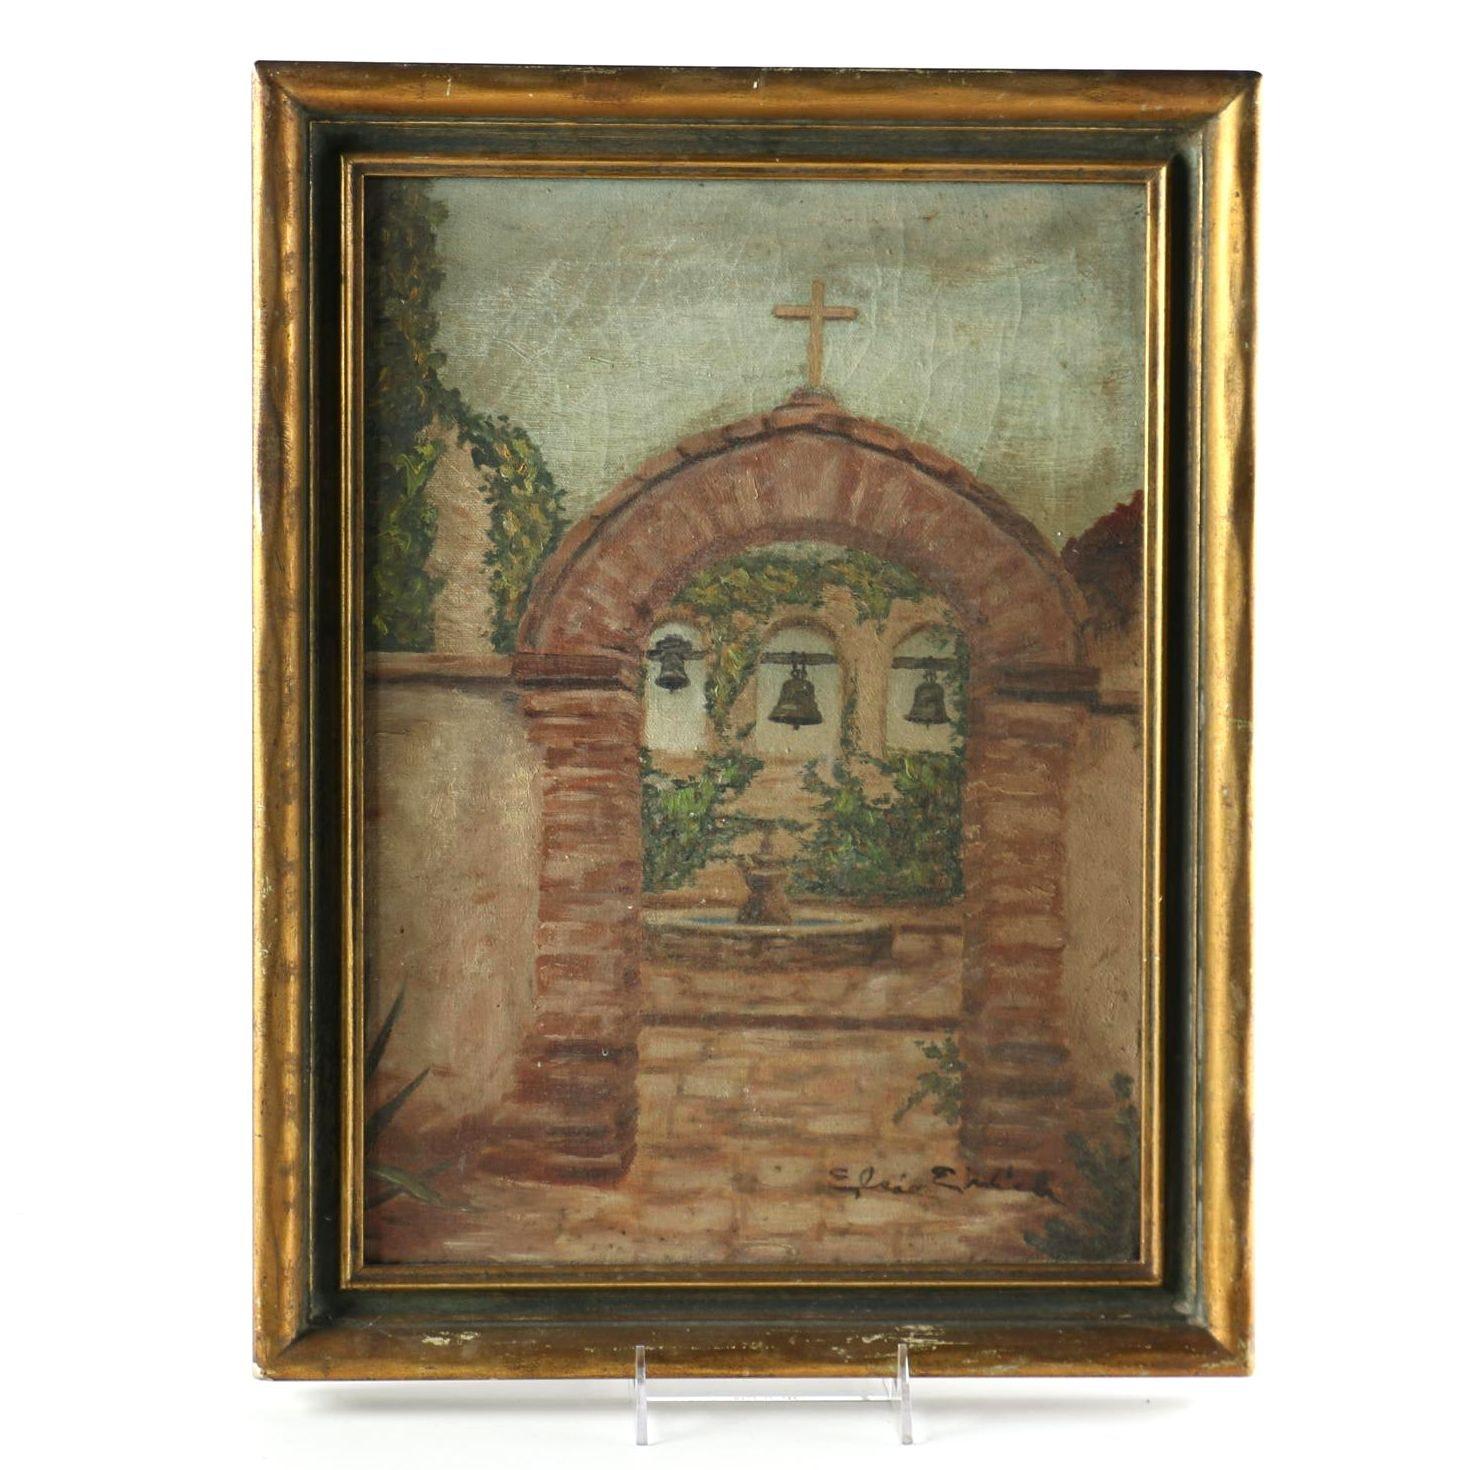 Elsie Ehrlich Oil on Canvas of Mission Bells